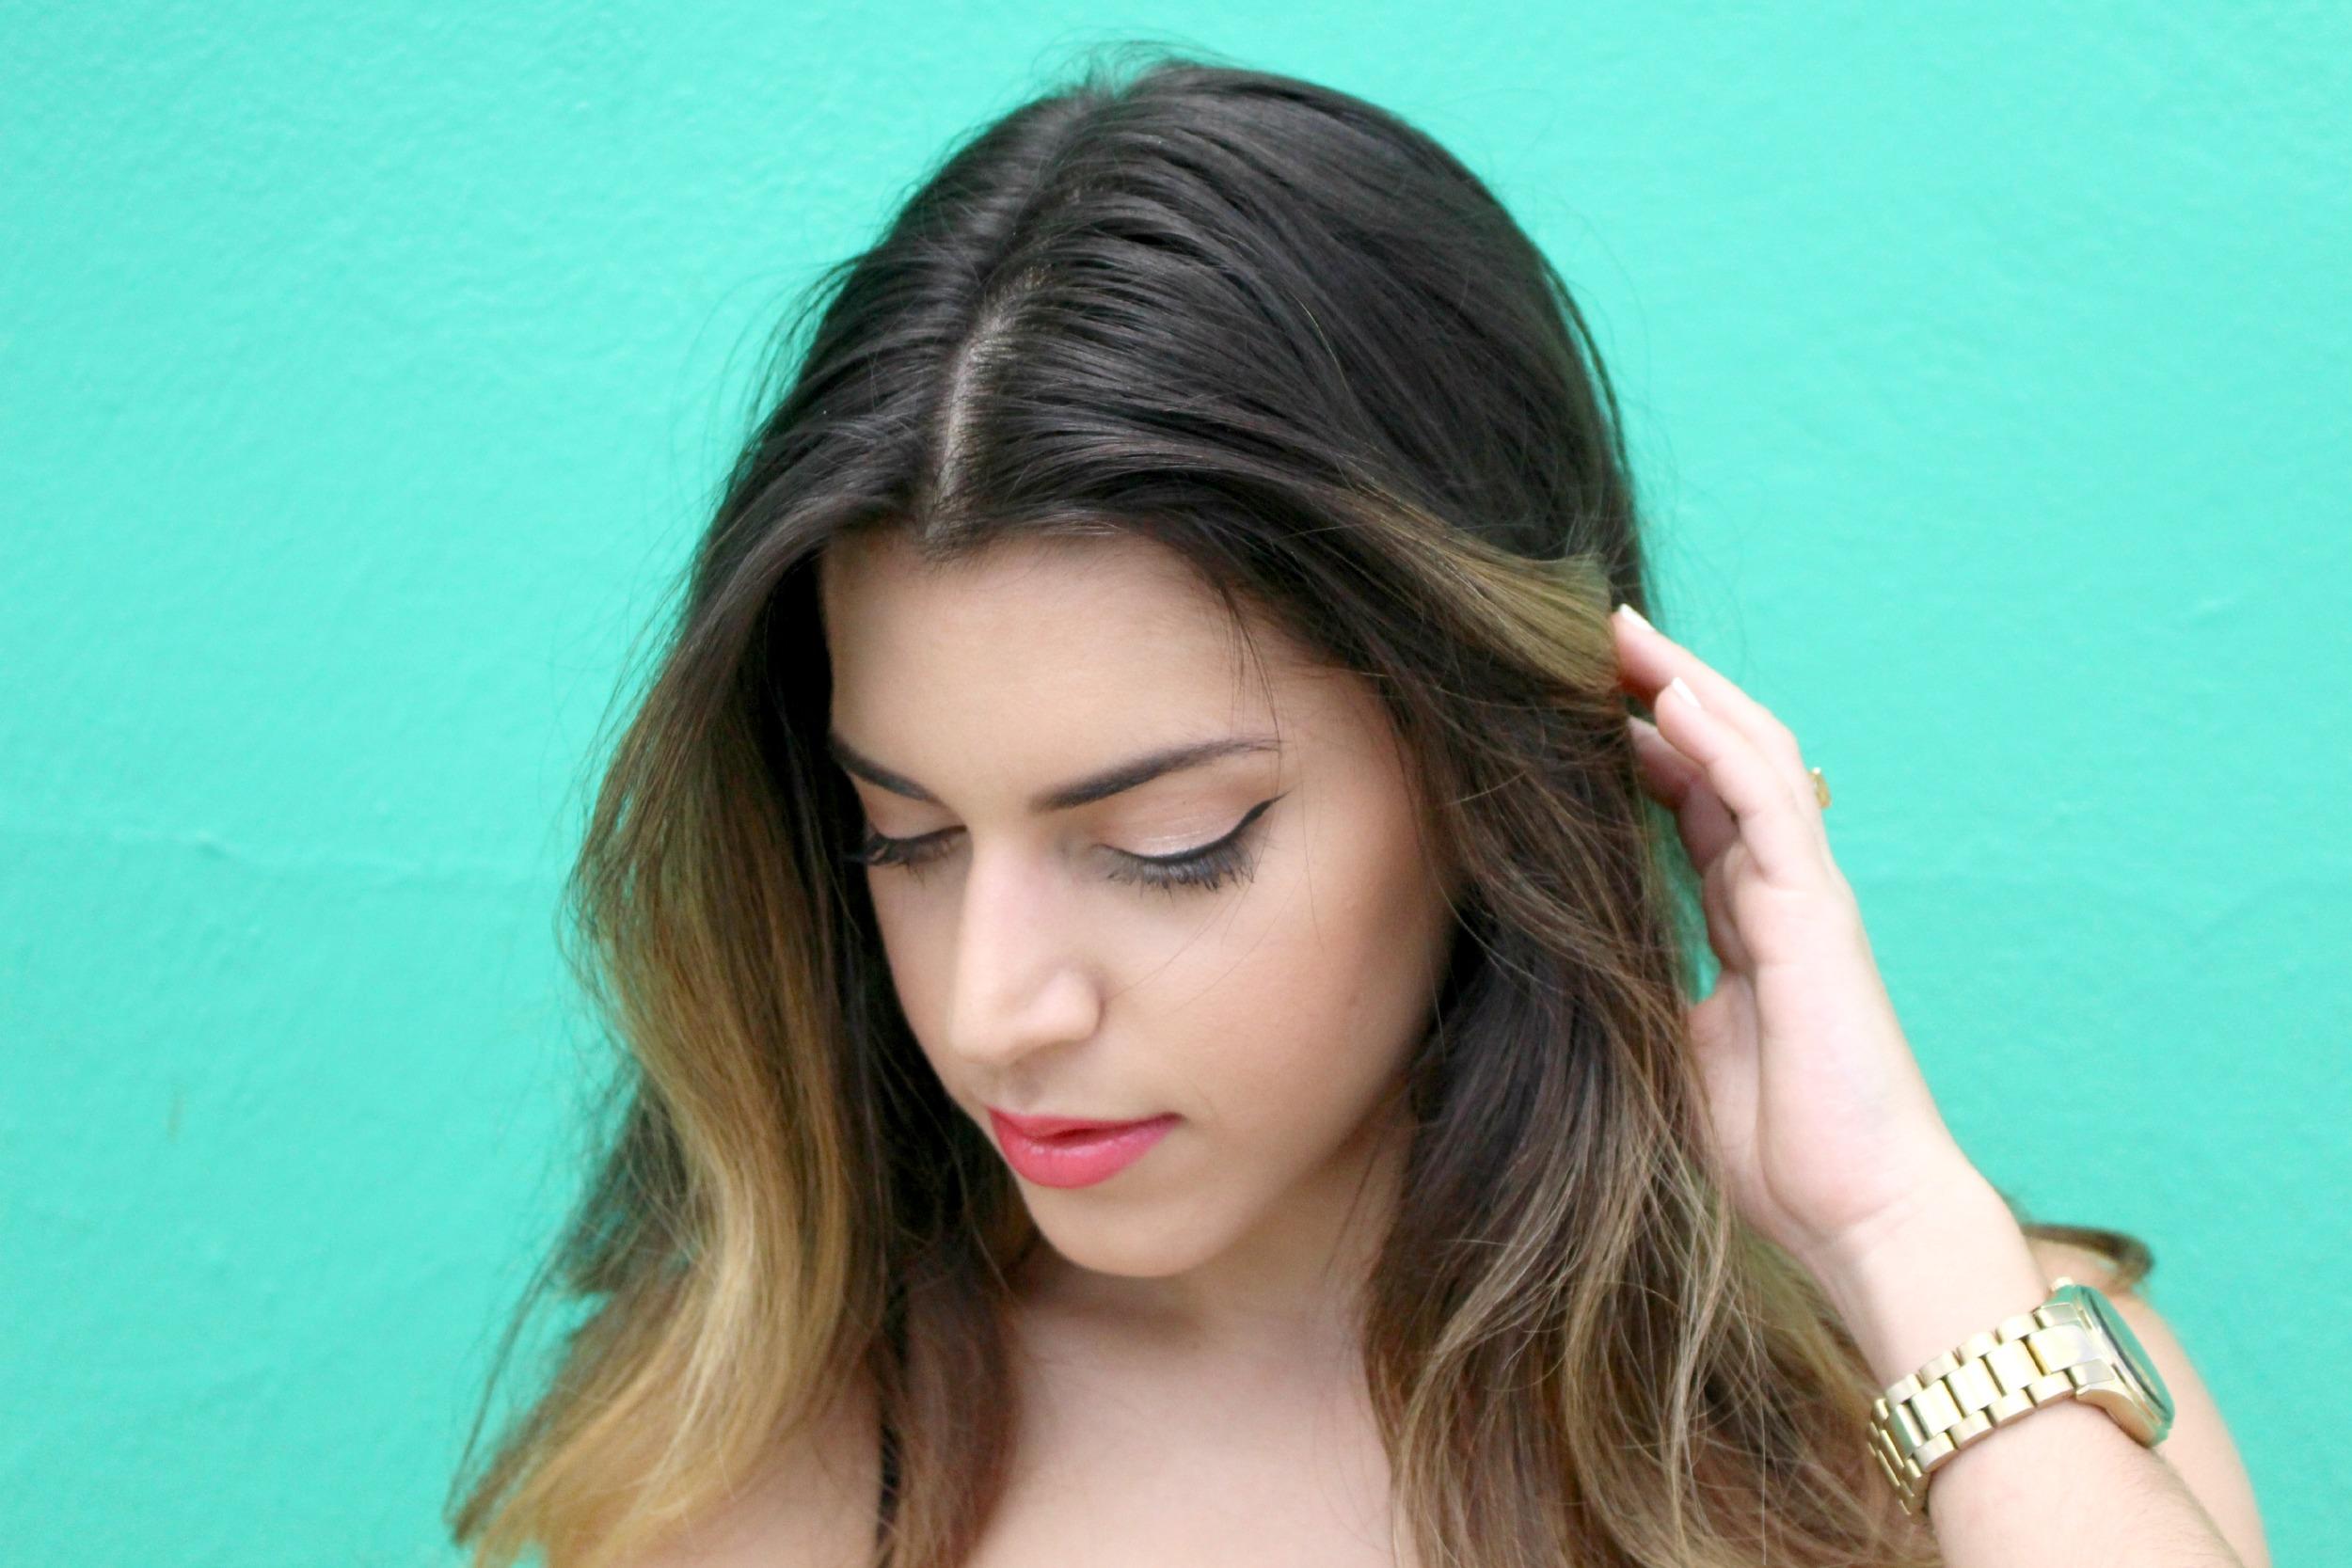 "Foundation // L'Oreal True match  Eyeshadows from Jaclyn Hill's Favorite Palette // Morphe Brushes  Contour // Kat Von D Shade and Light Palette  Lipstick // ""Snow Peach"" Revlon"